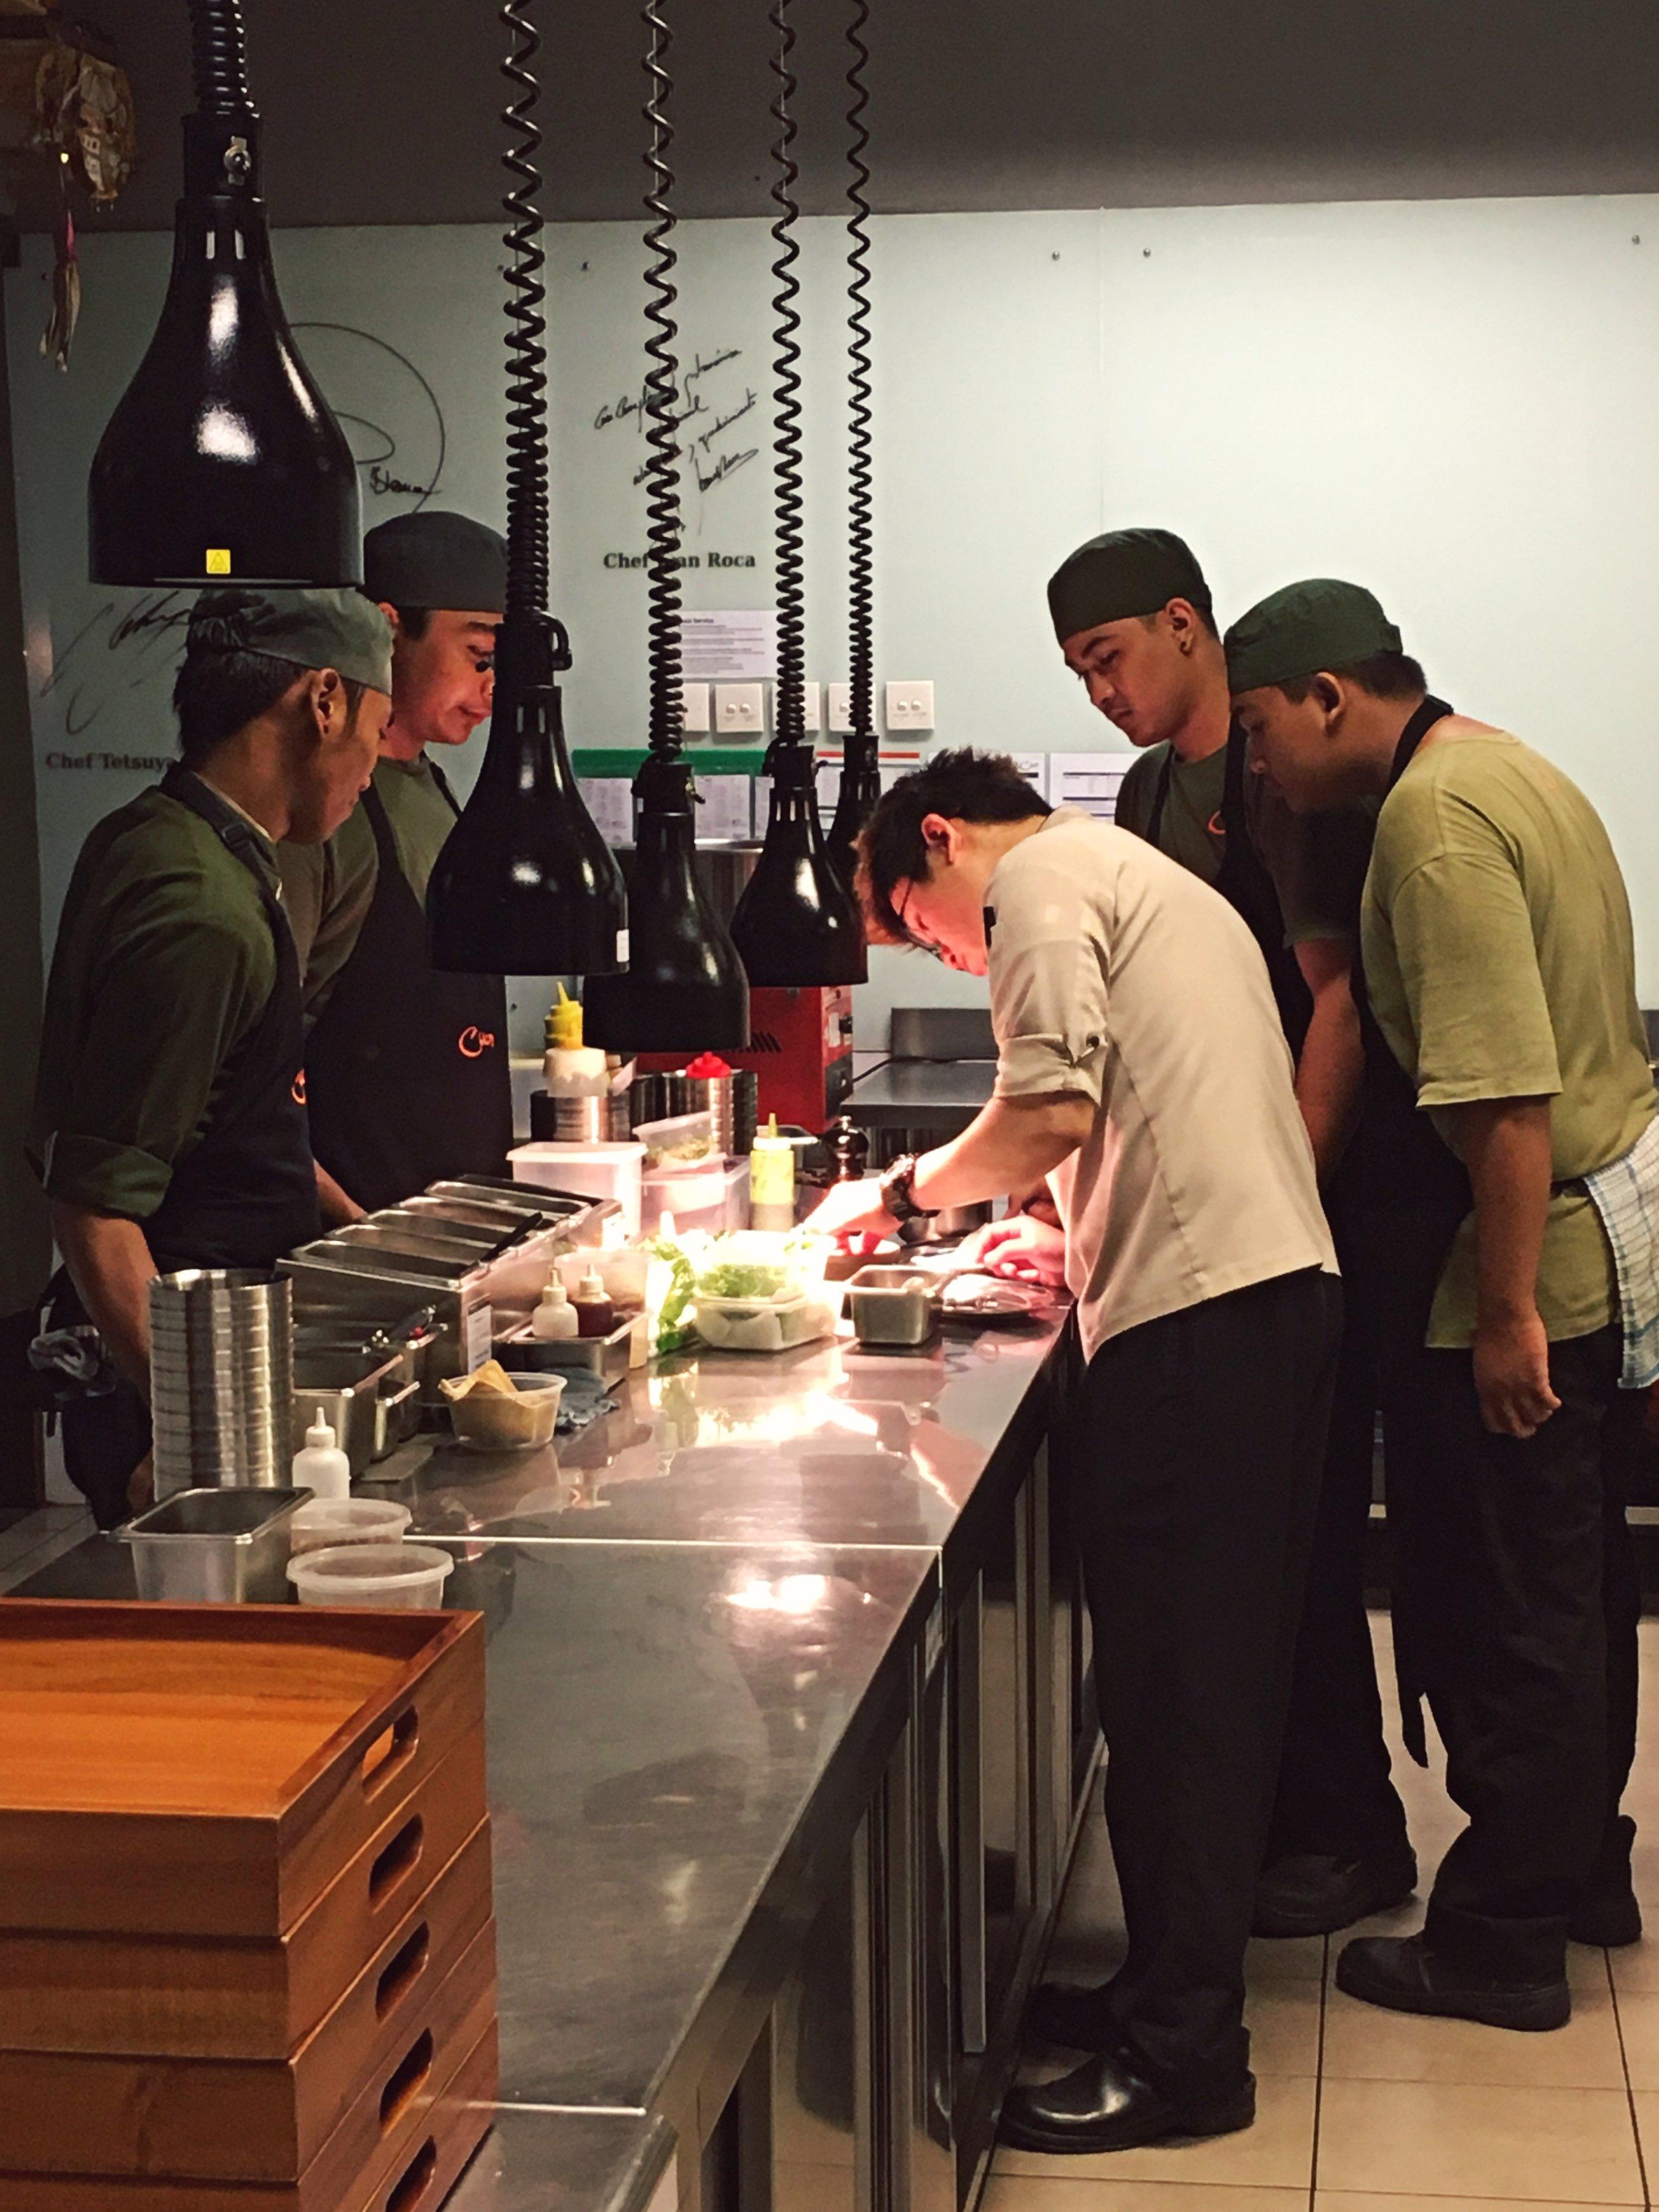 Chef Tasting Menu - Feeling adventurous?Try the